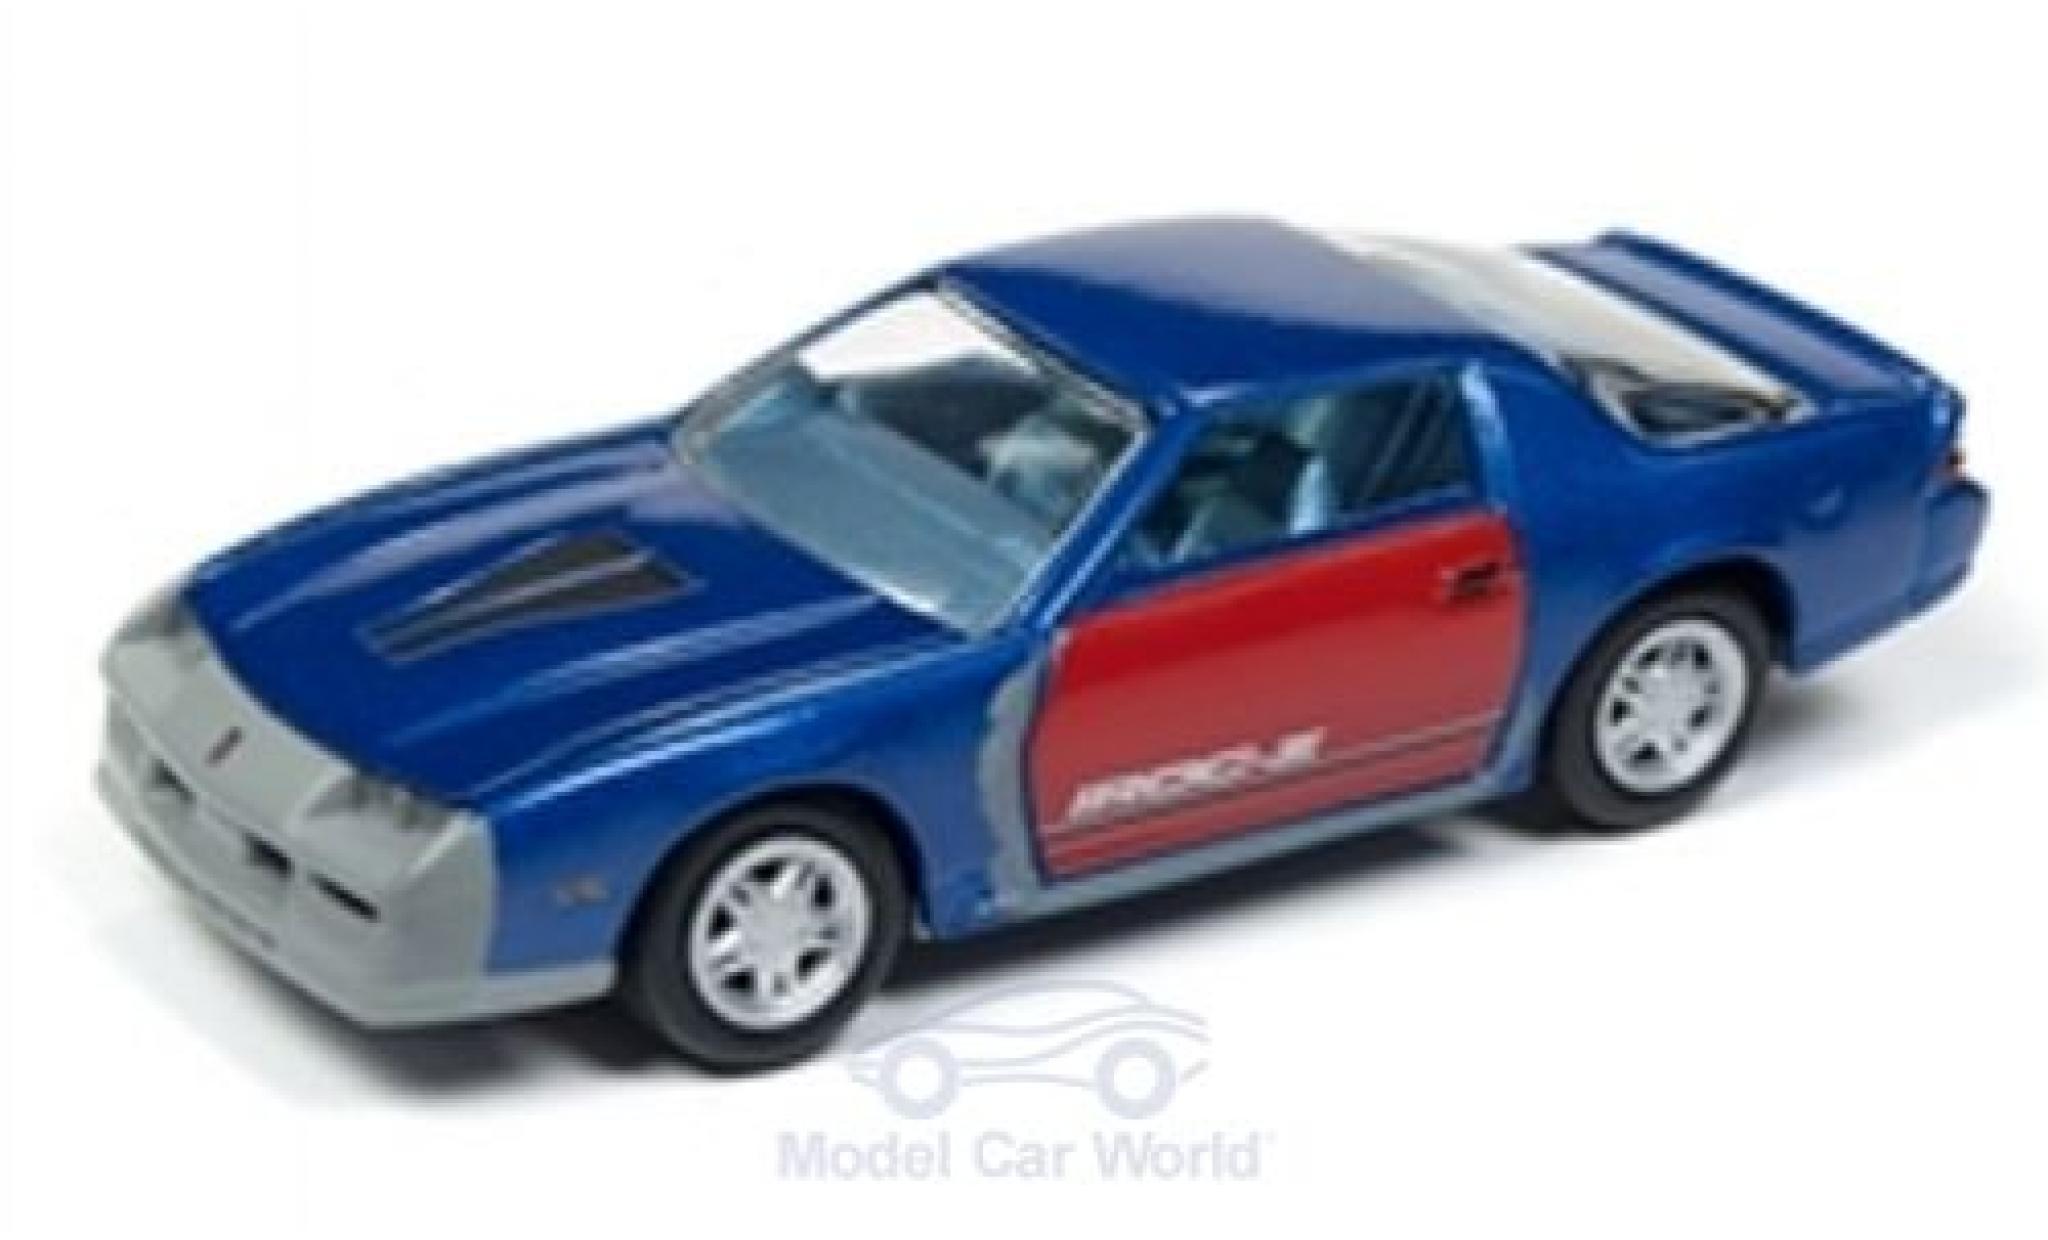 Chevrolet Camaro Z28 1/64 Johnny Lightning Z28 IROC-Z metallise blue/red 1987 Tuning